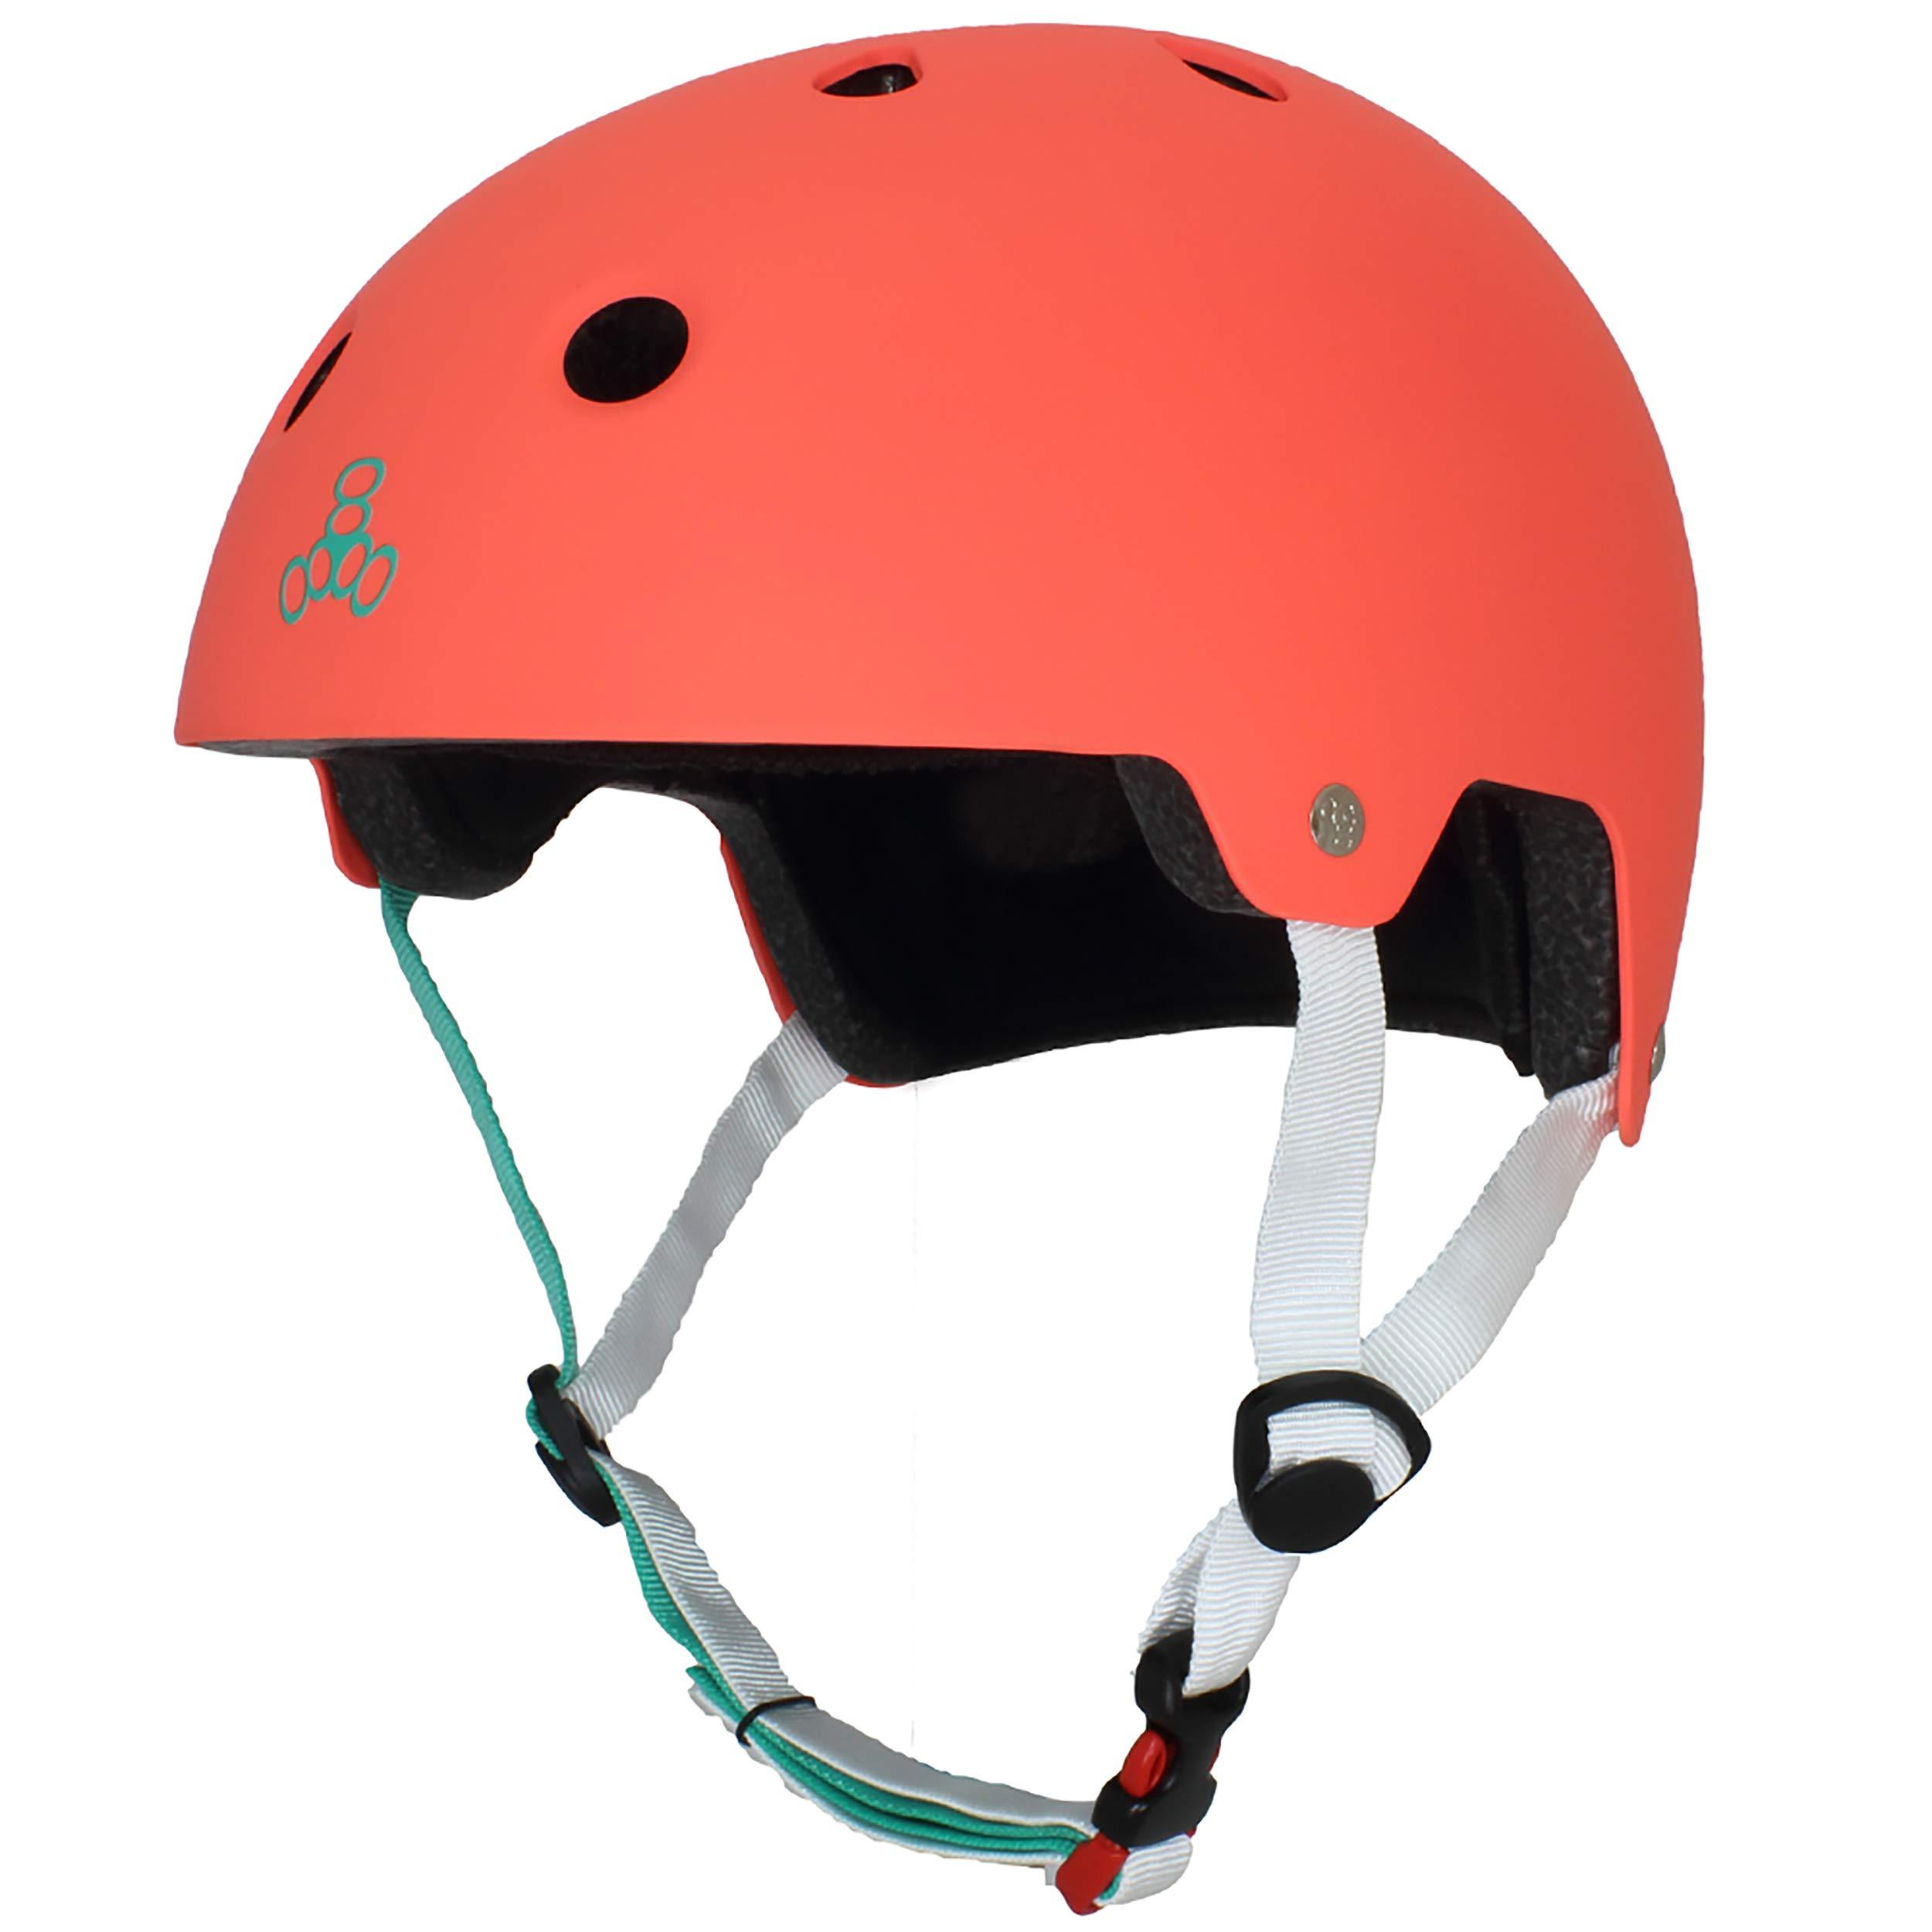 Triple Eight Dual Certified Bike and Skateboard Helmet, Neon Tangerine Matte, X-Small / Small